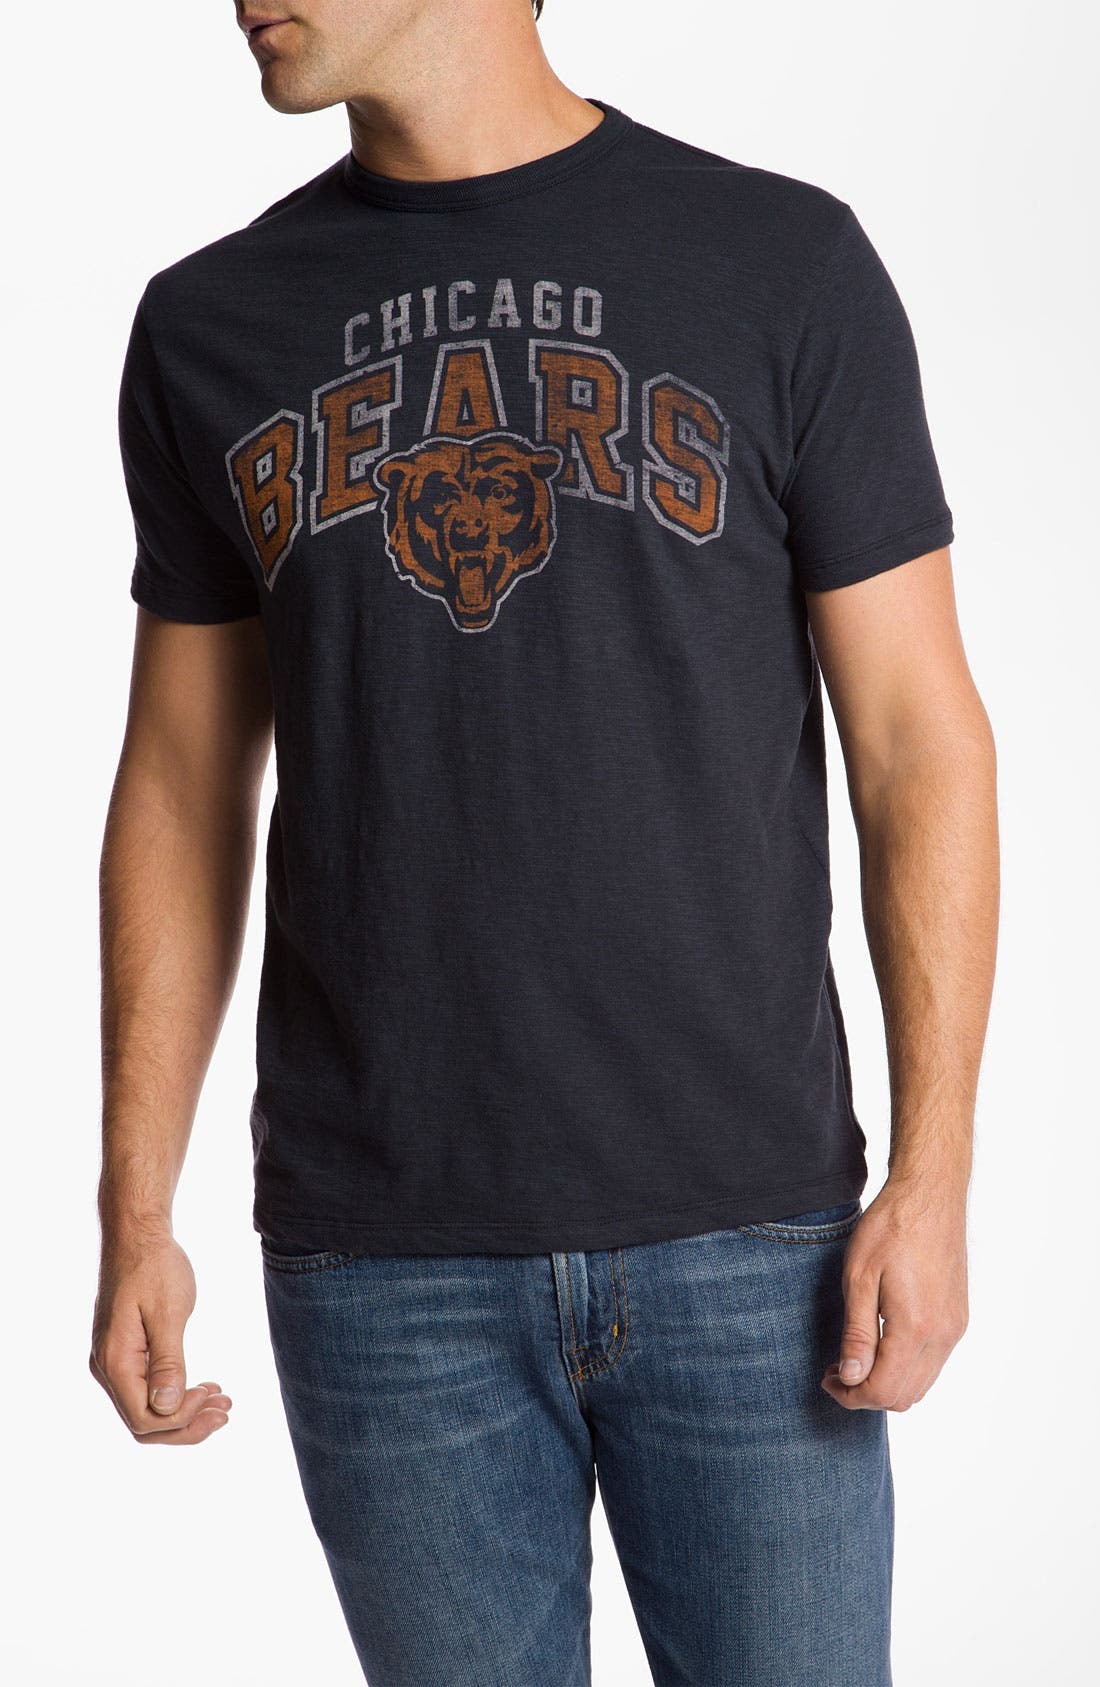 Main Image - Banner 47 'Chicago Bears' T-Shirt